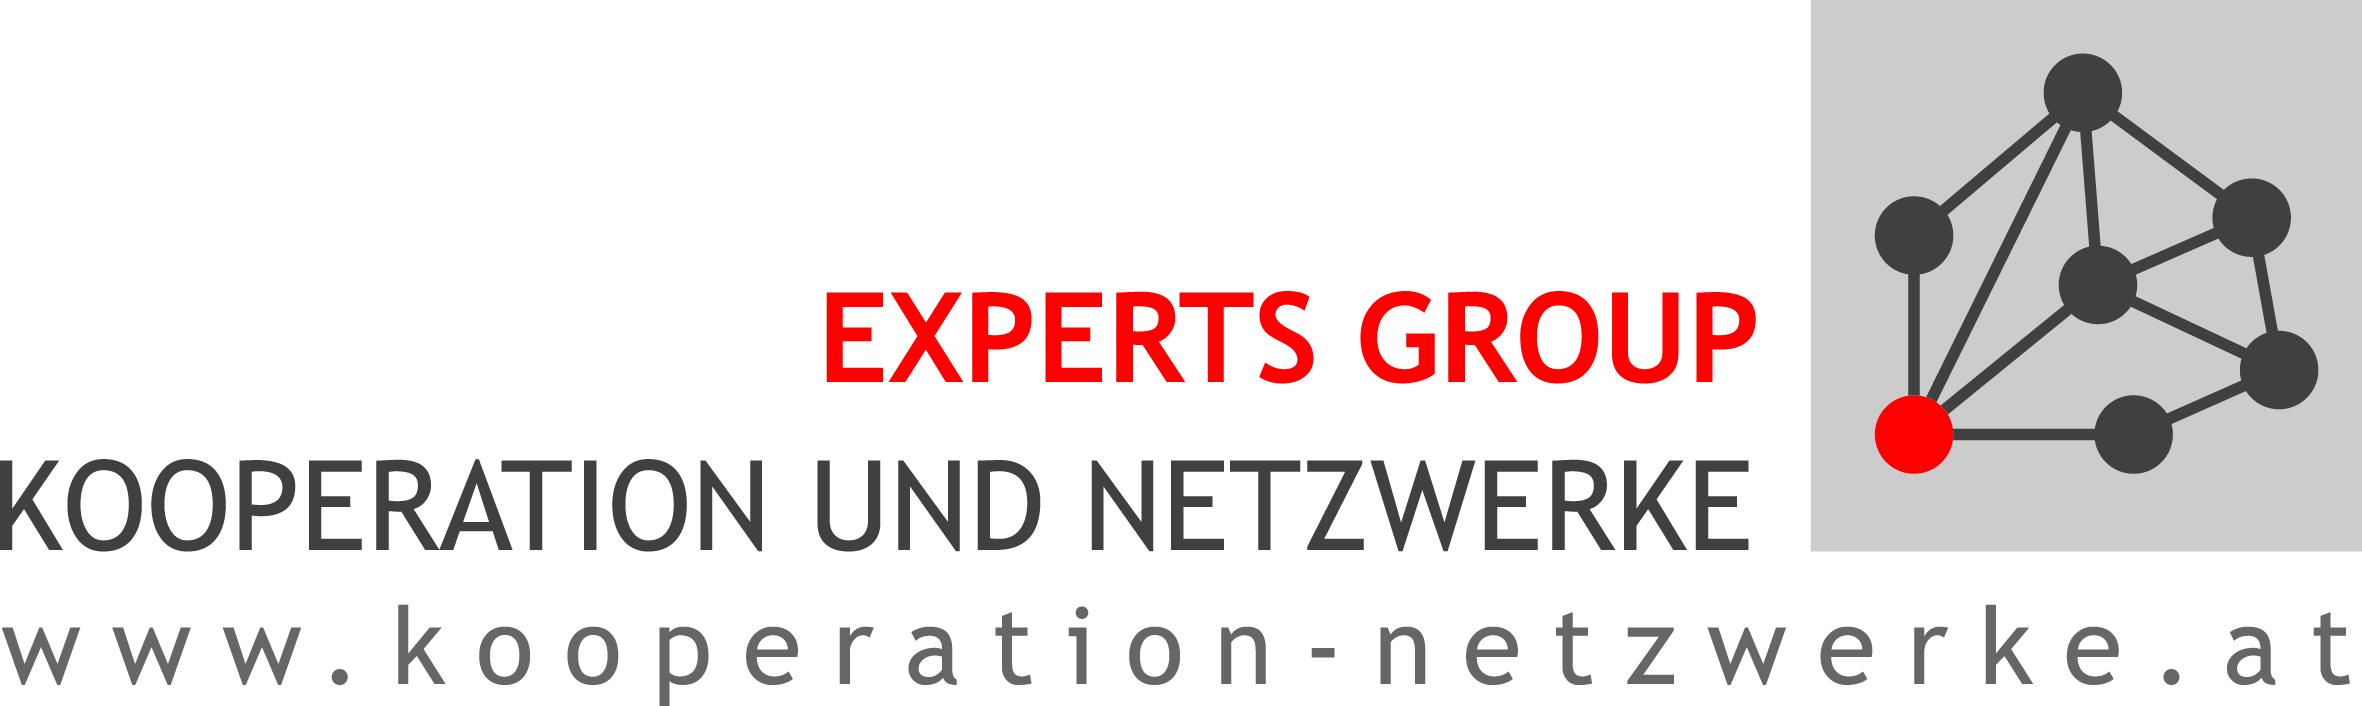 experts logo_4c 300dpi